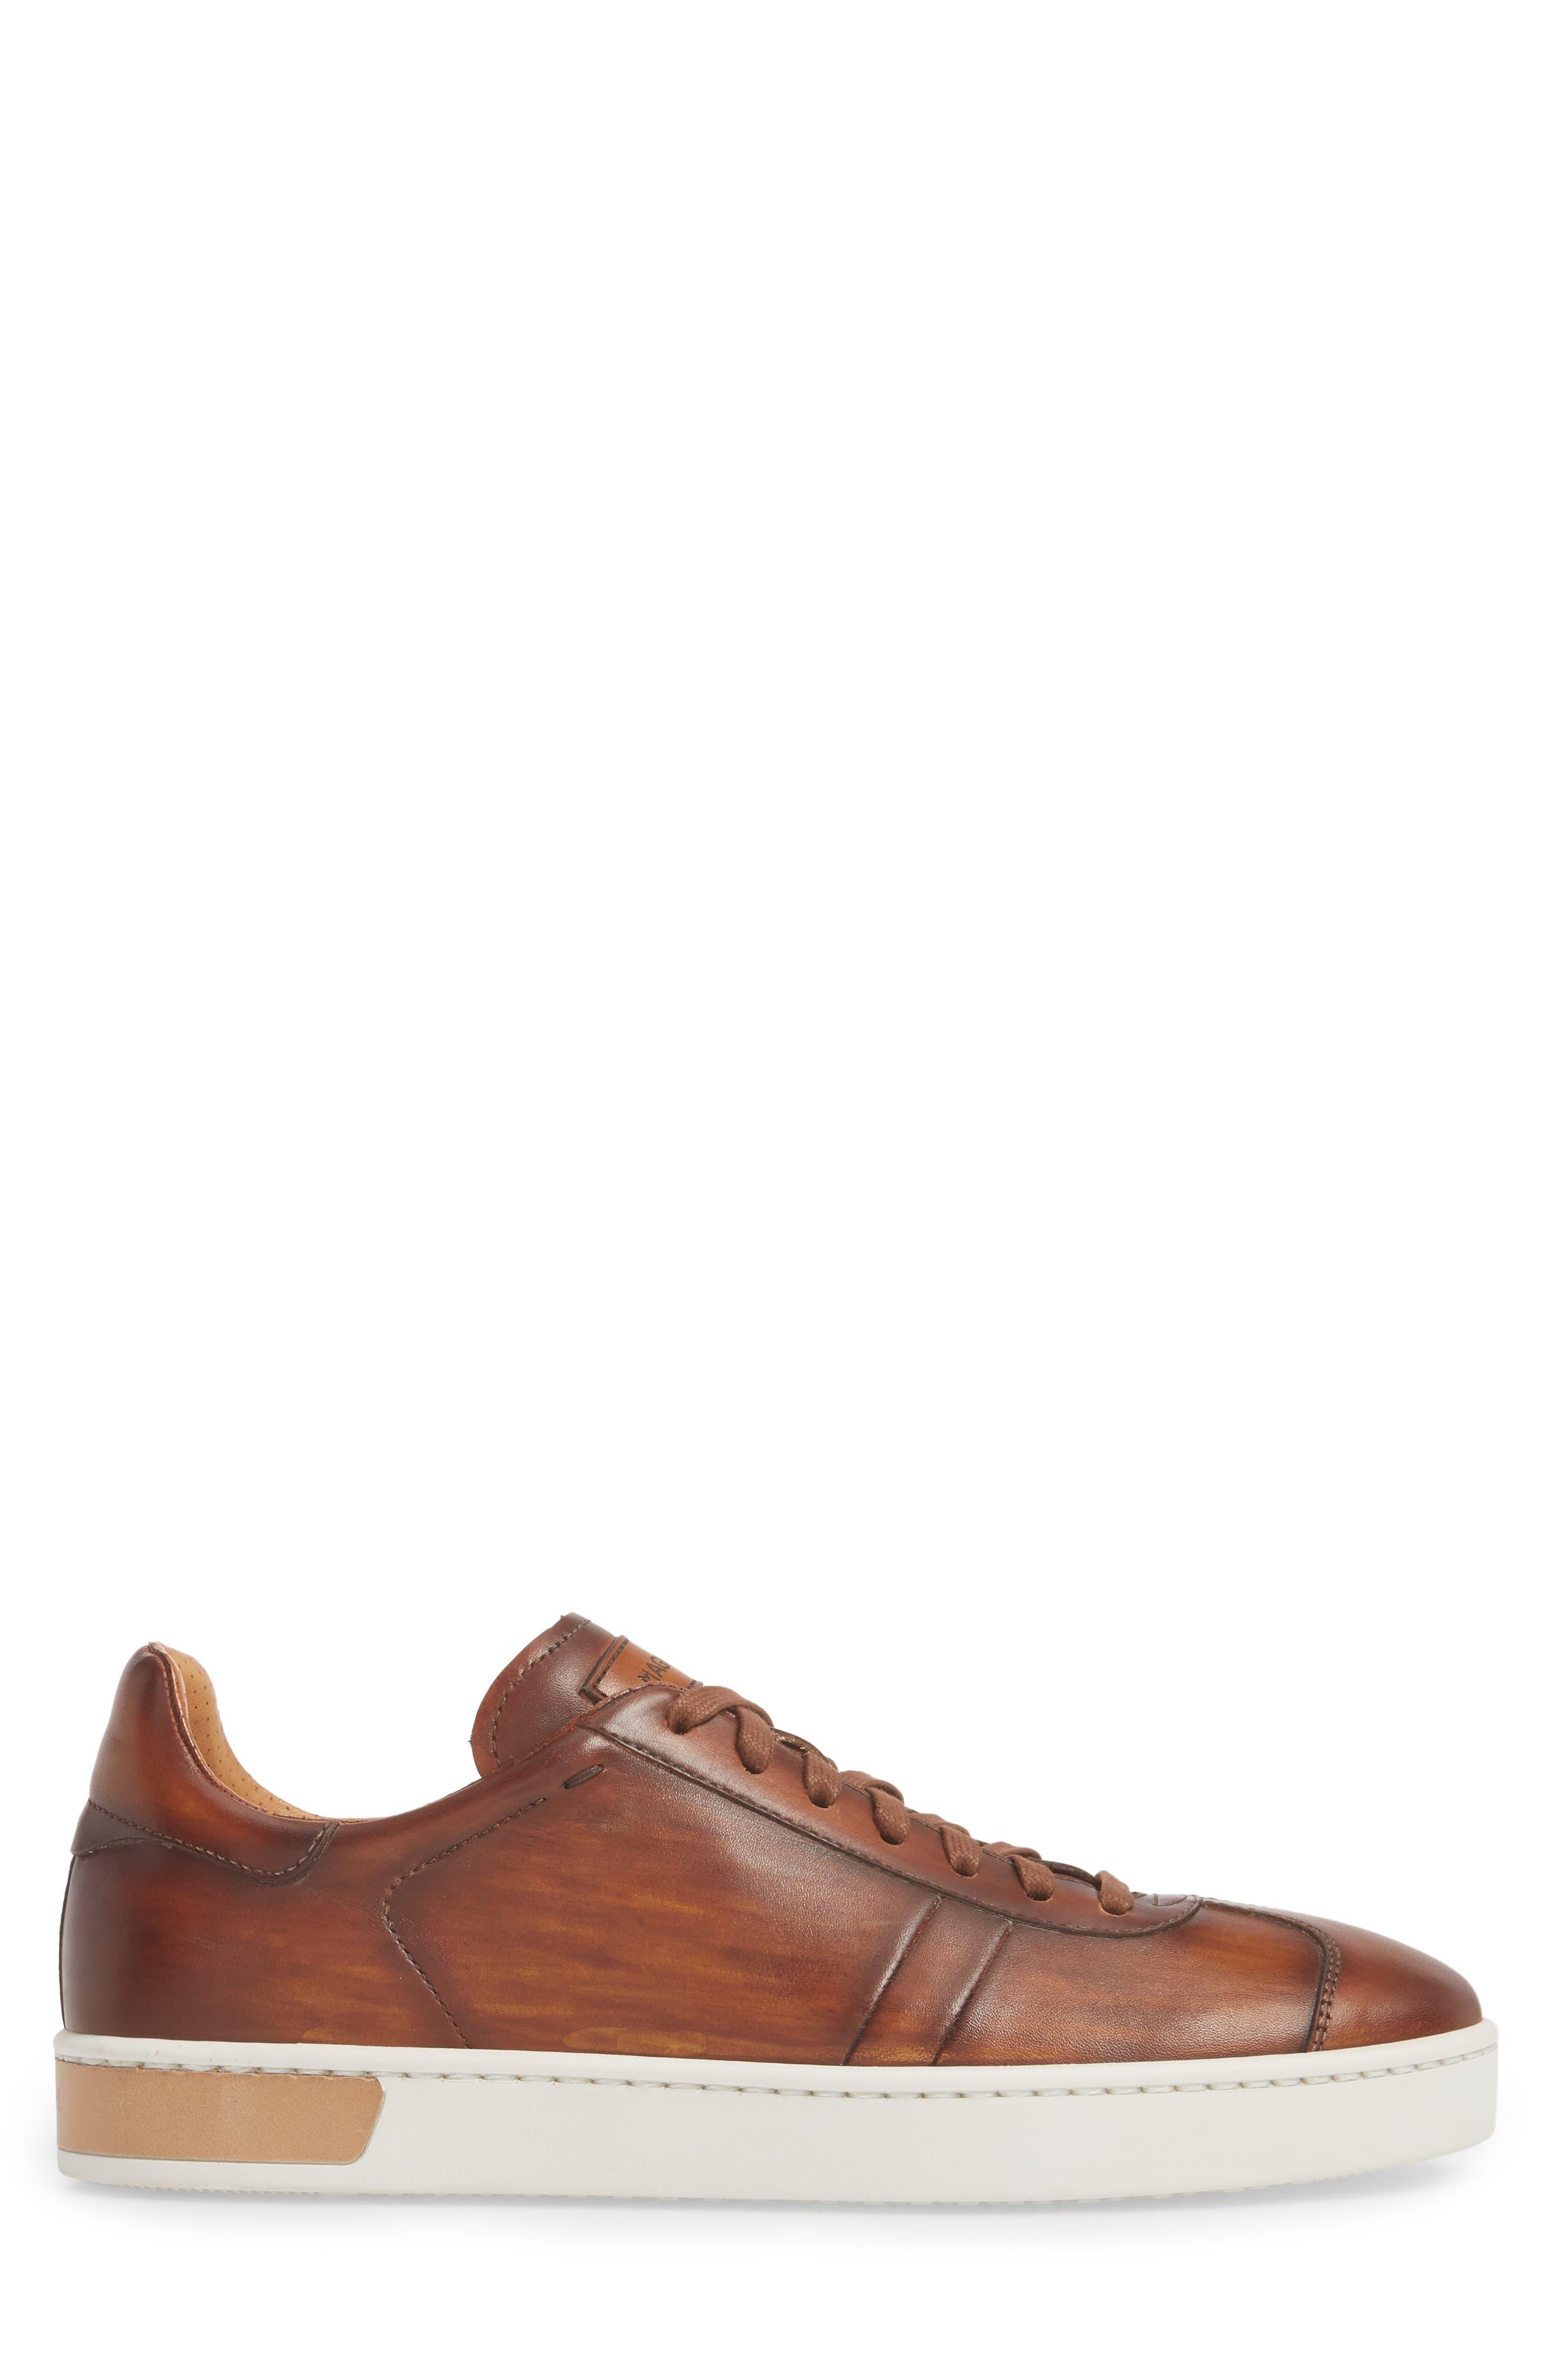 Gunner Low Top Sneaker,                             Alternate thumbnail 3, color,                             Cuero Leather